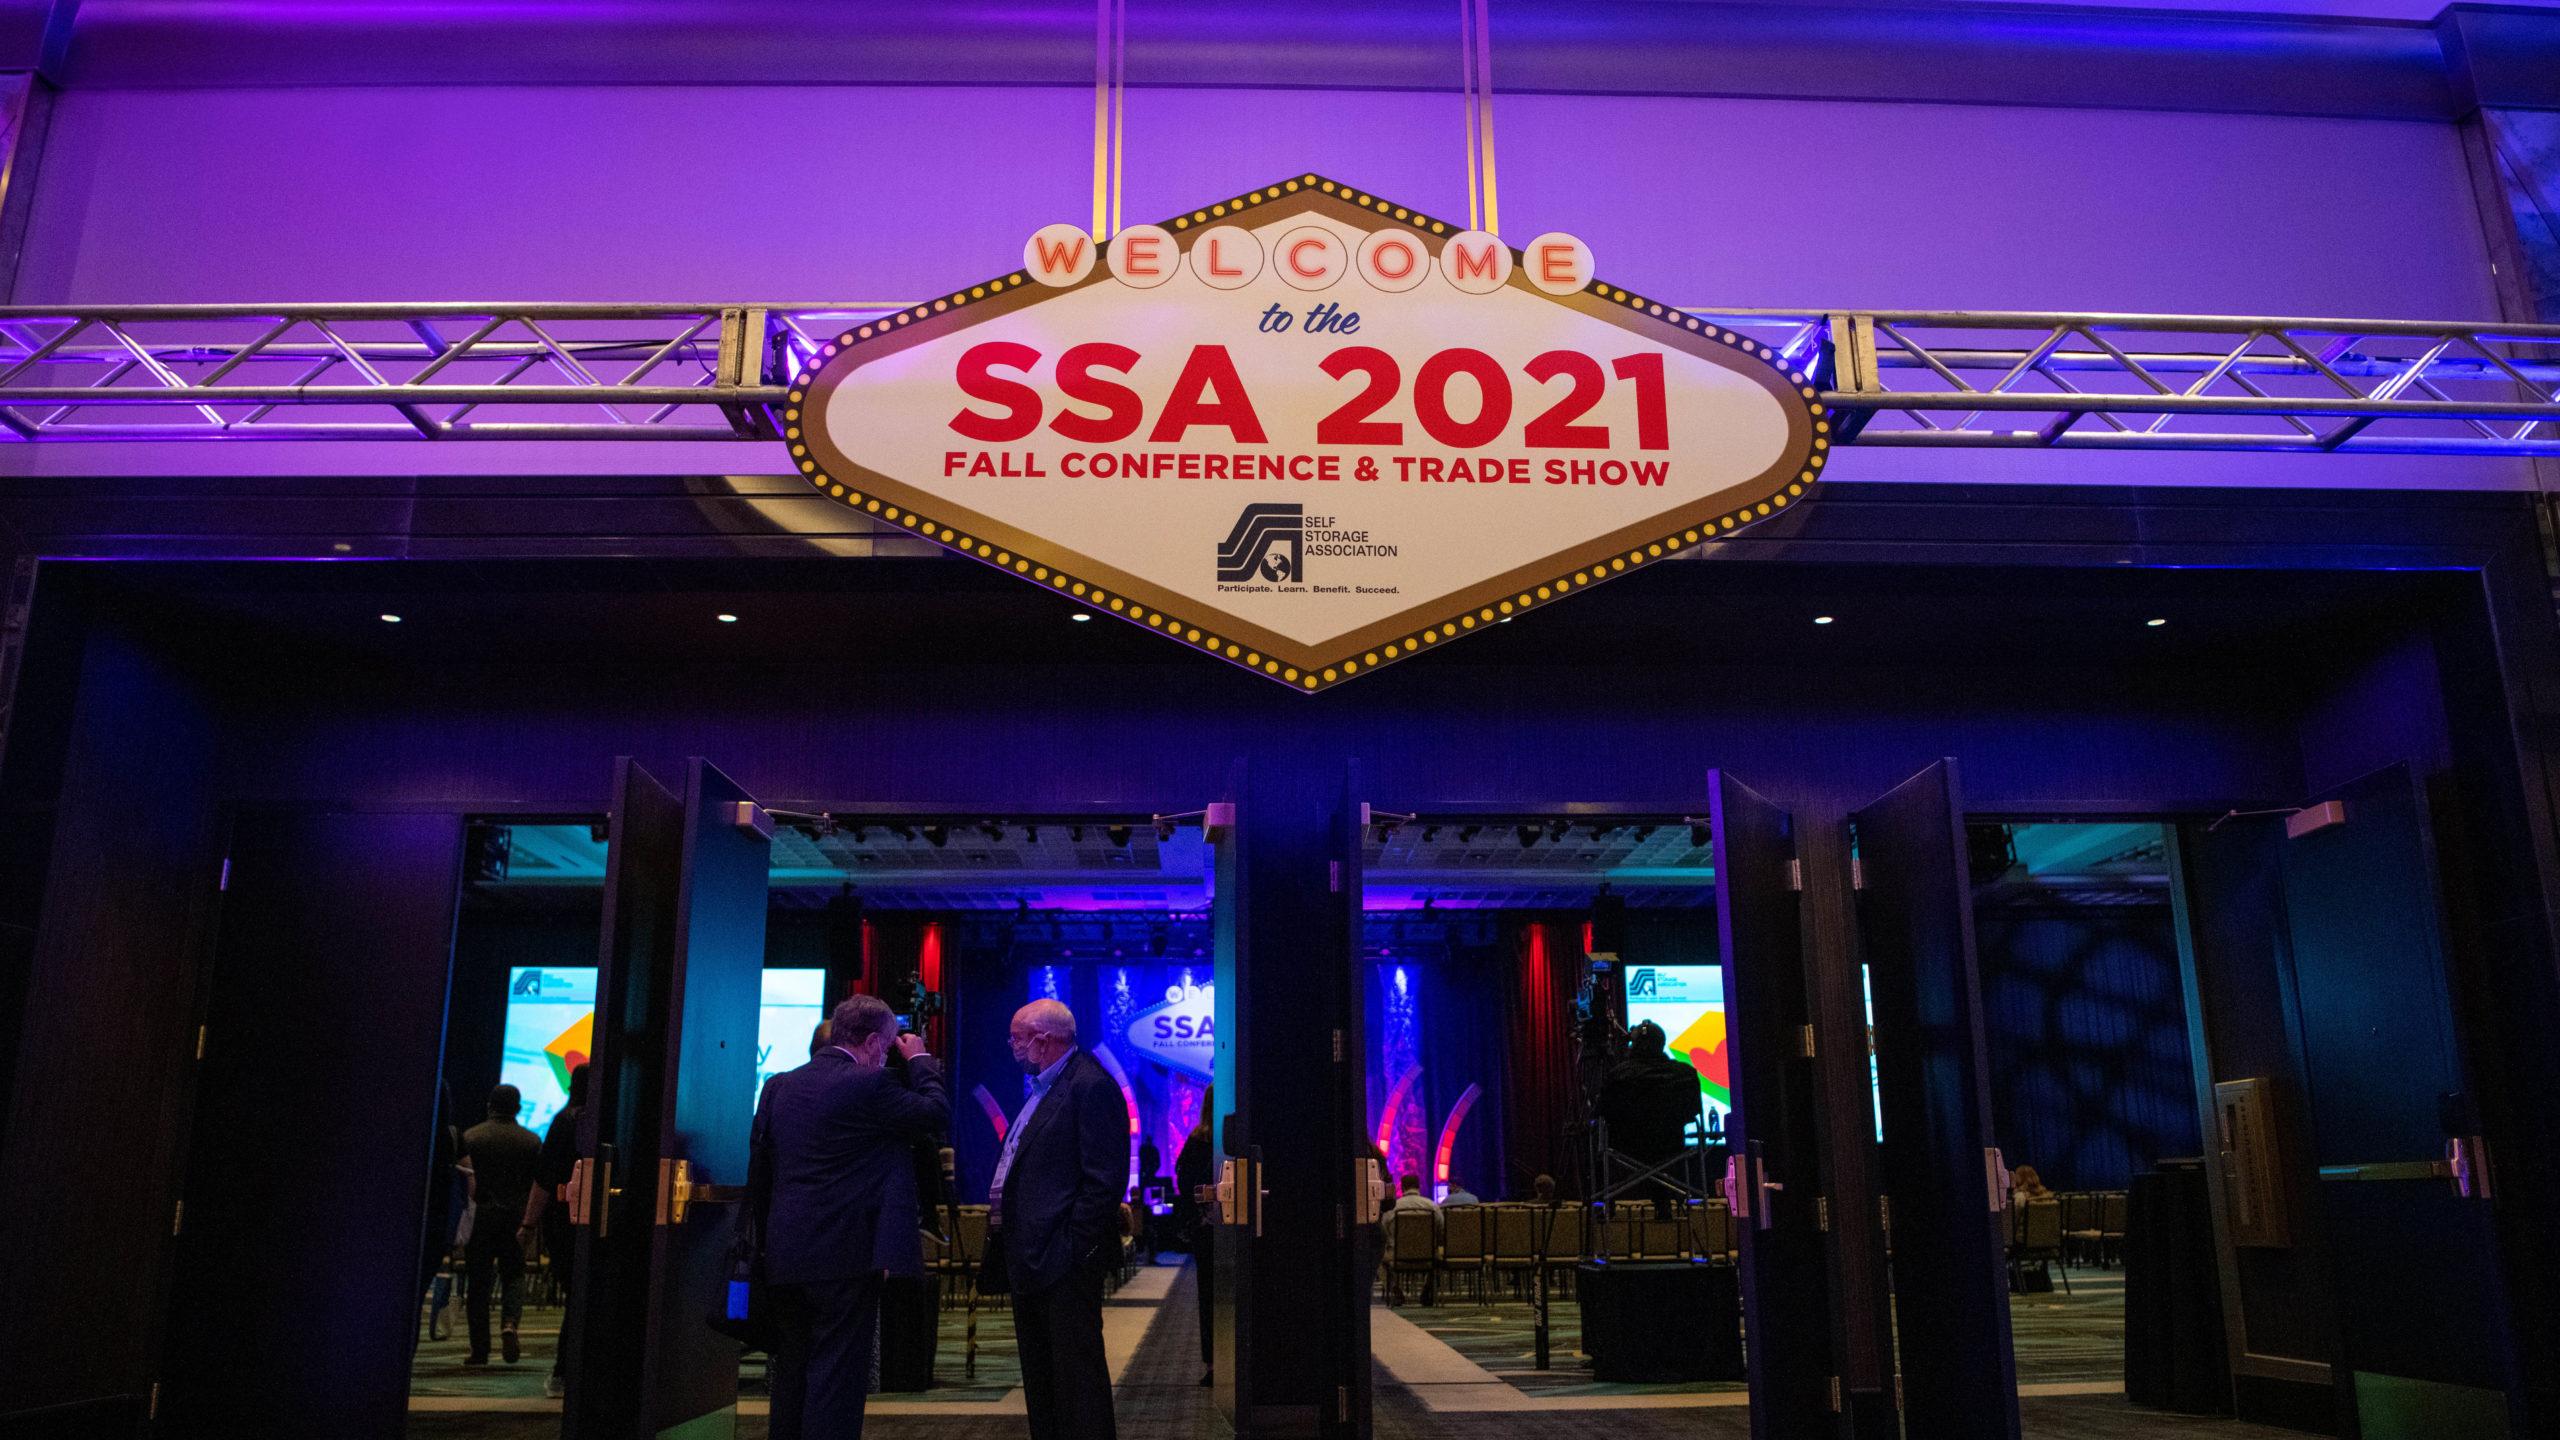 ssa conference entrance